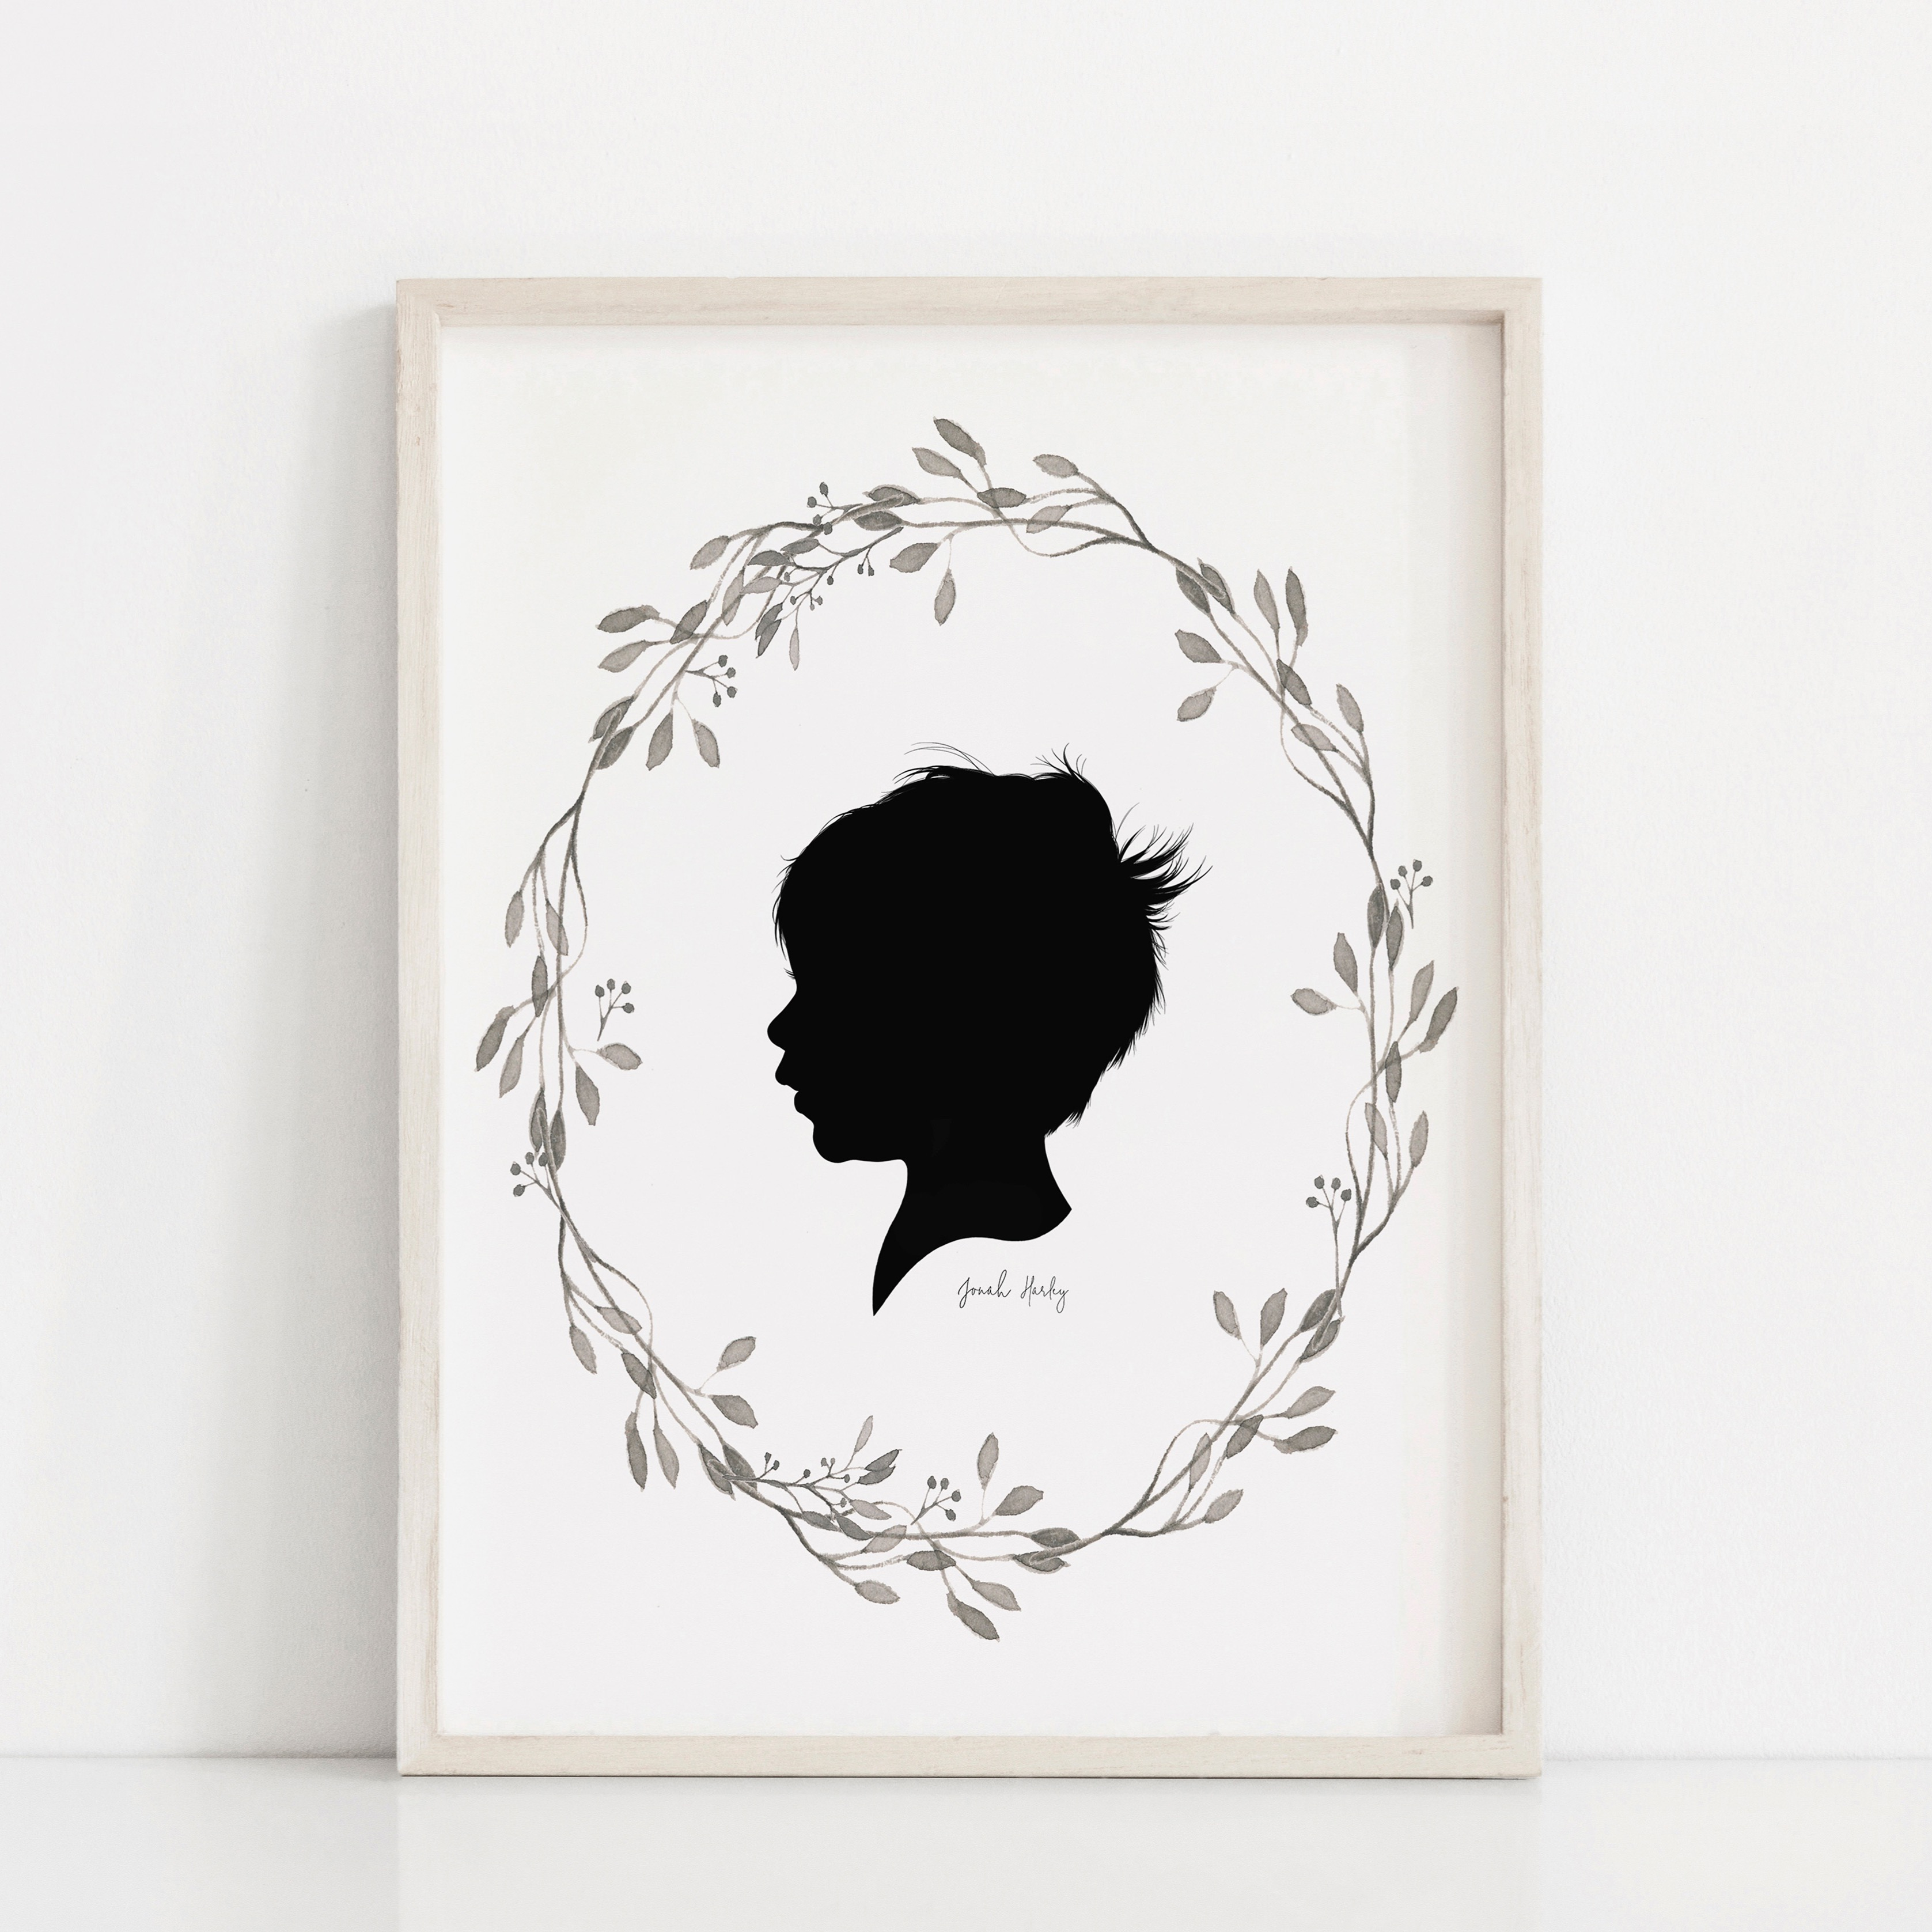 Shop Hand Drawn Silhouette Portraits